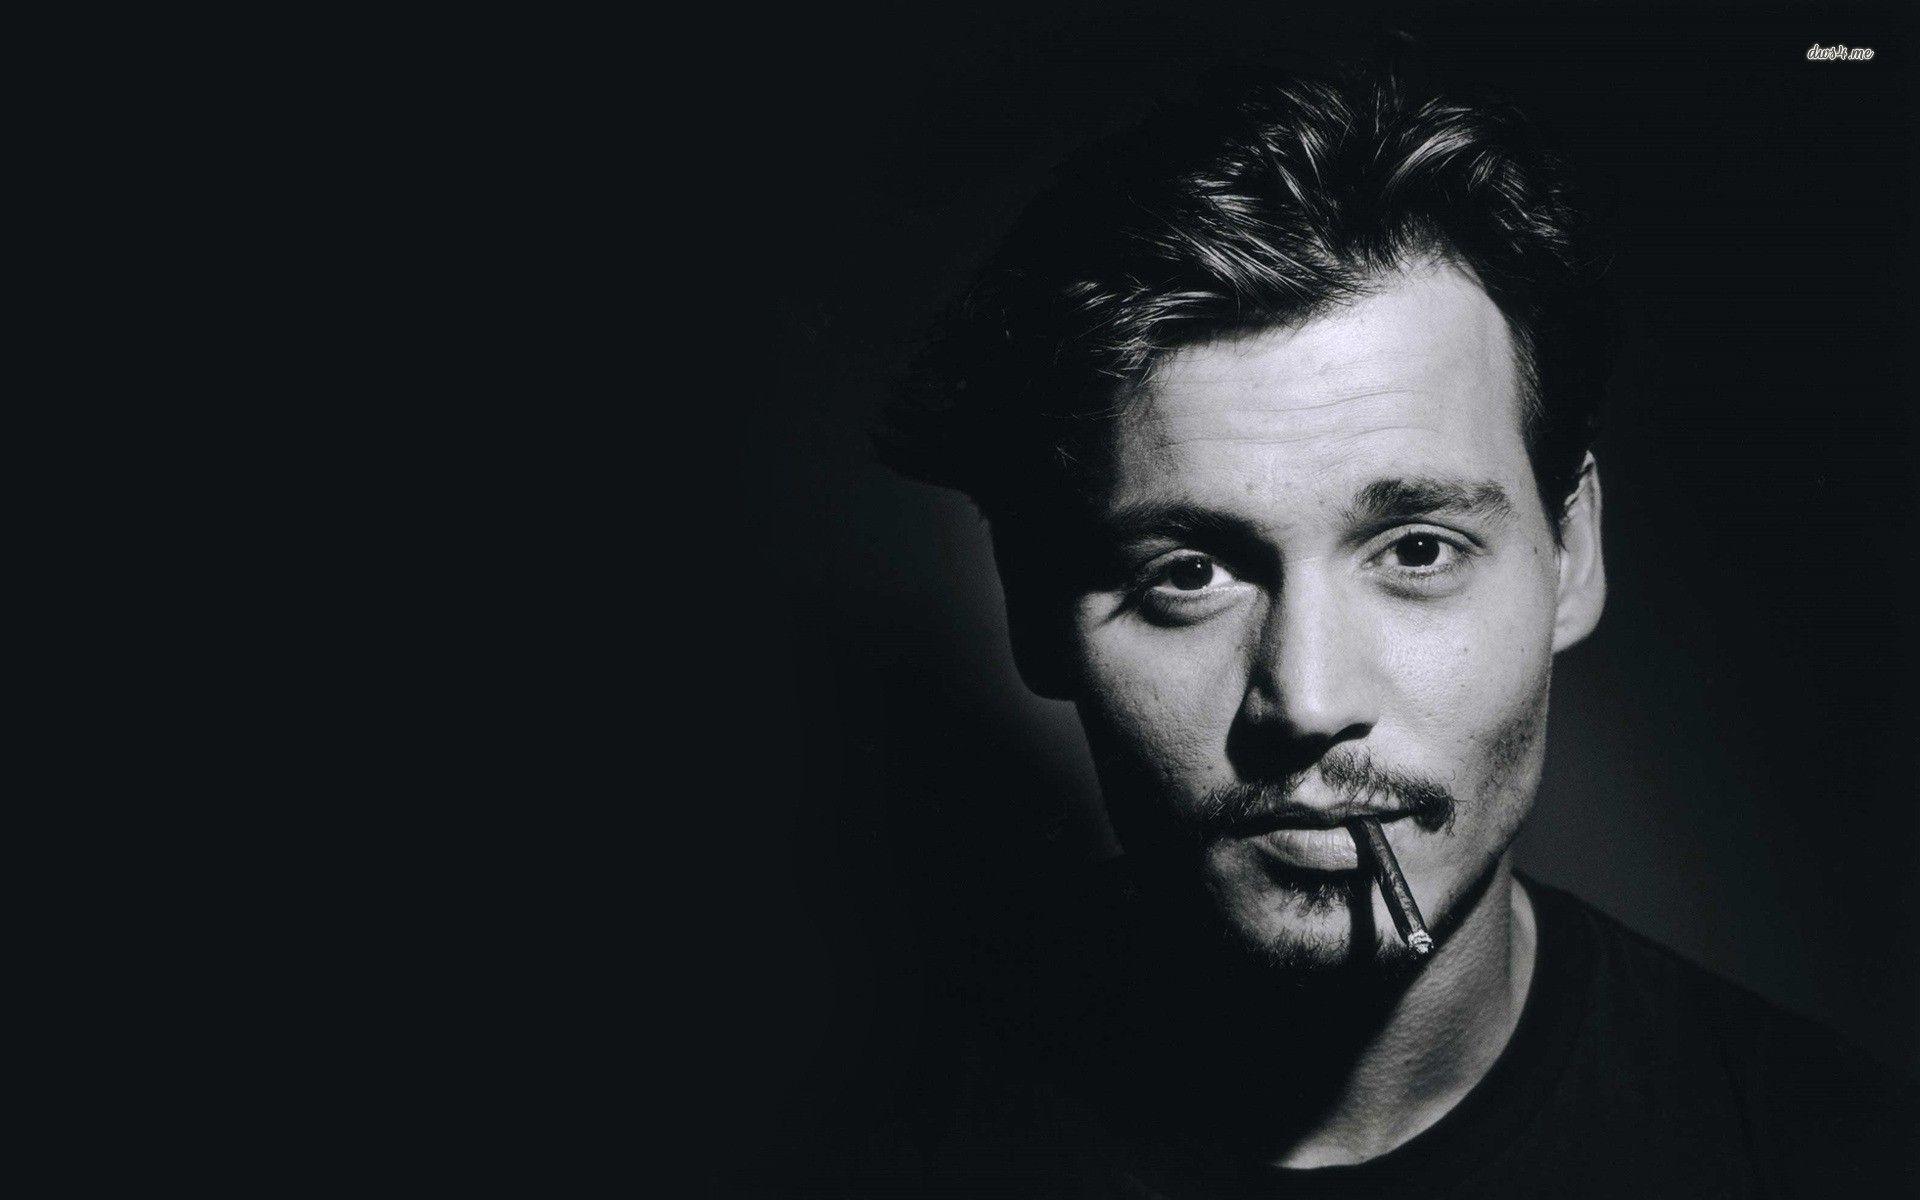 Johnny Depp Net Worth & Possessions